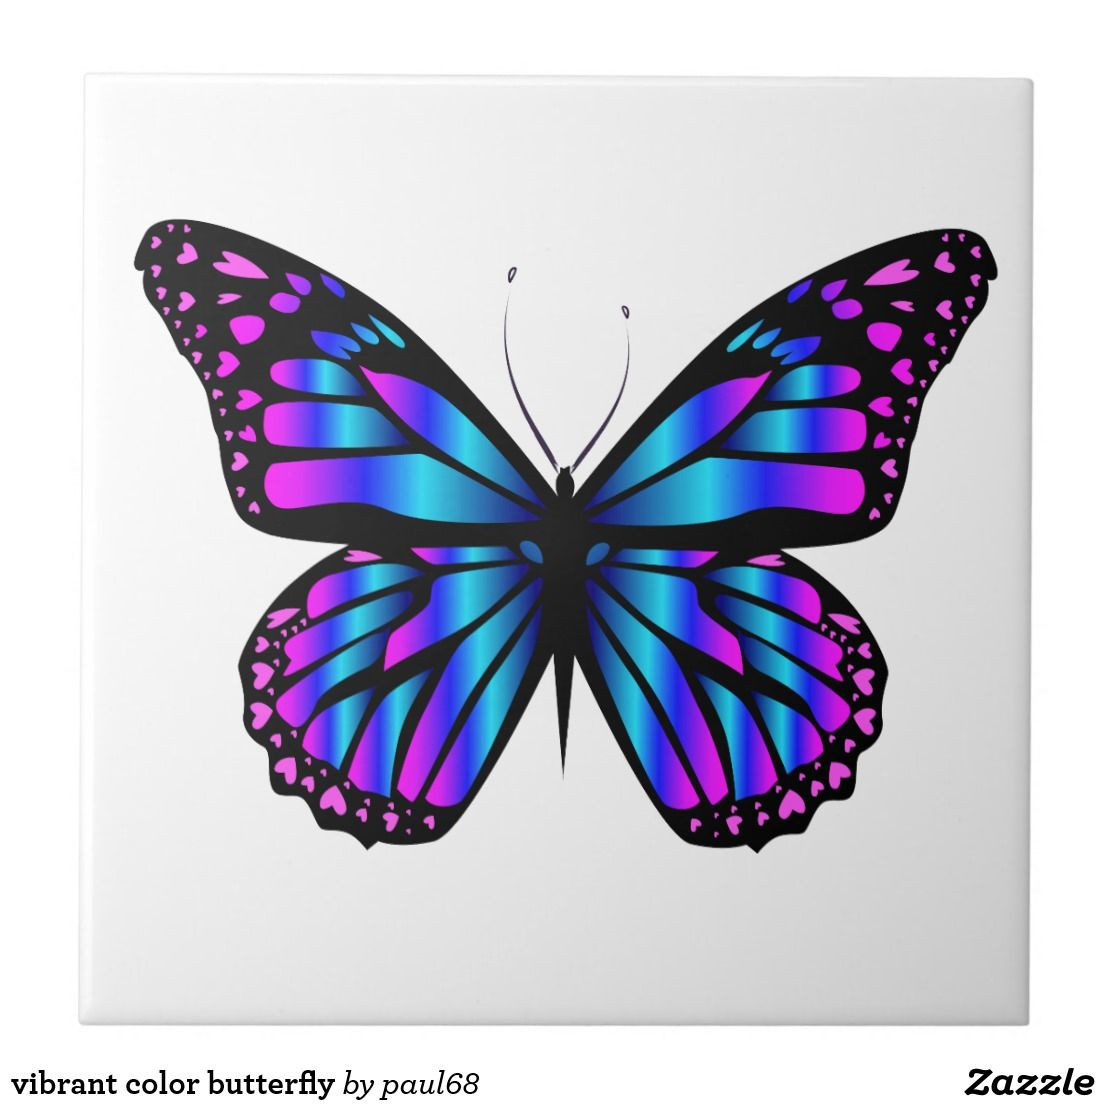 Vibrant Color Butterfly Ceramic Tile Zazzle Com In 2021 Butterfly Drawing Butterfly Painting Butterfly Coloring Page [ 1106 x 1106 Pixel ]